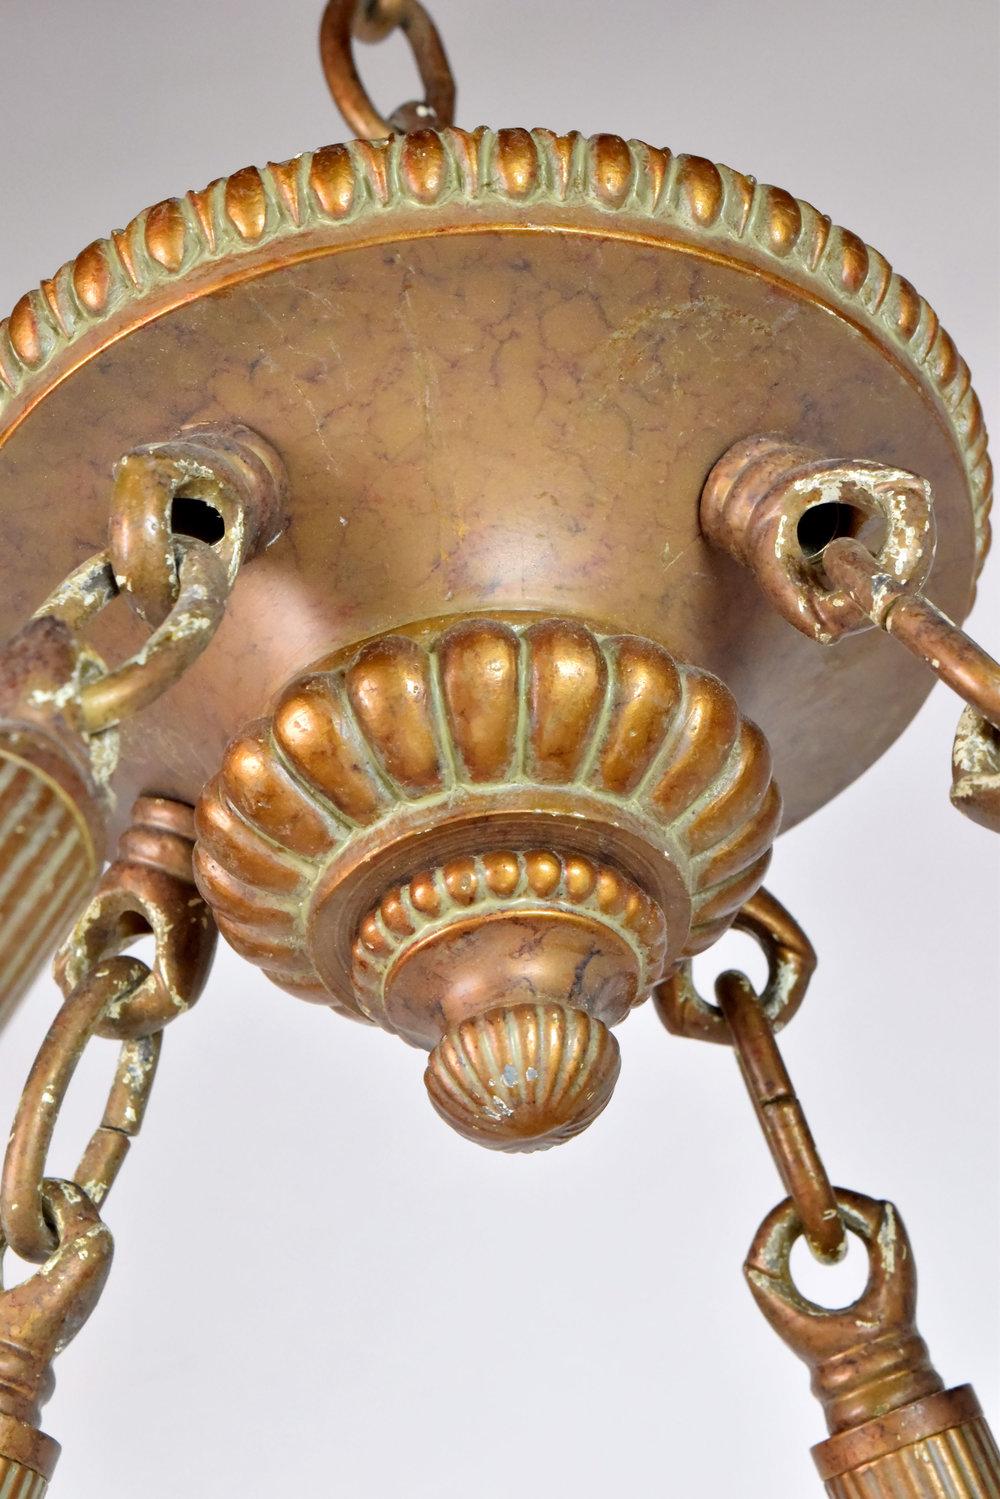 47169-large-bowl-fixture-arm-detail.jpg